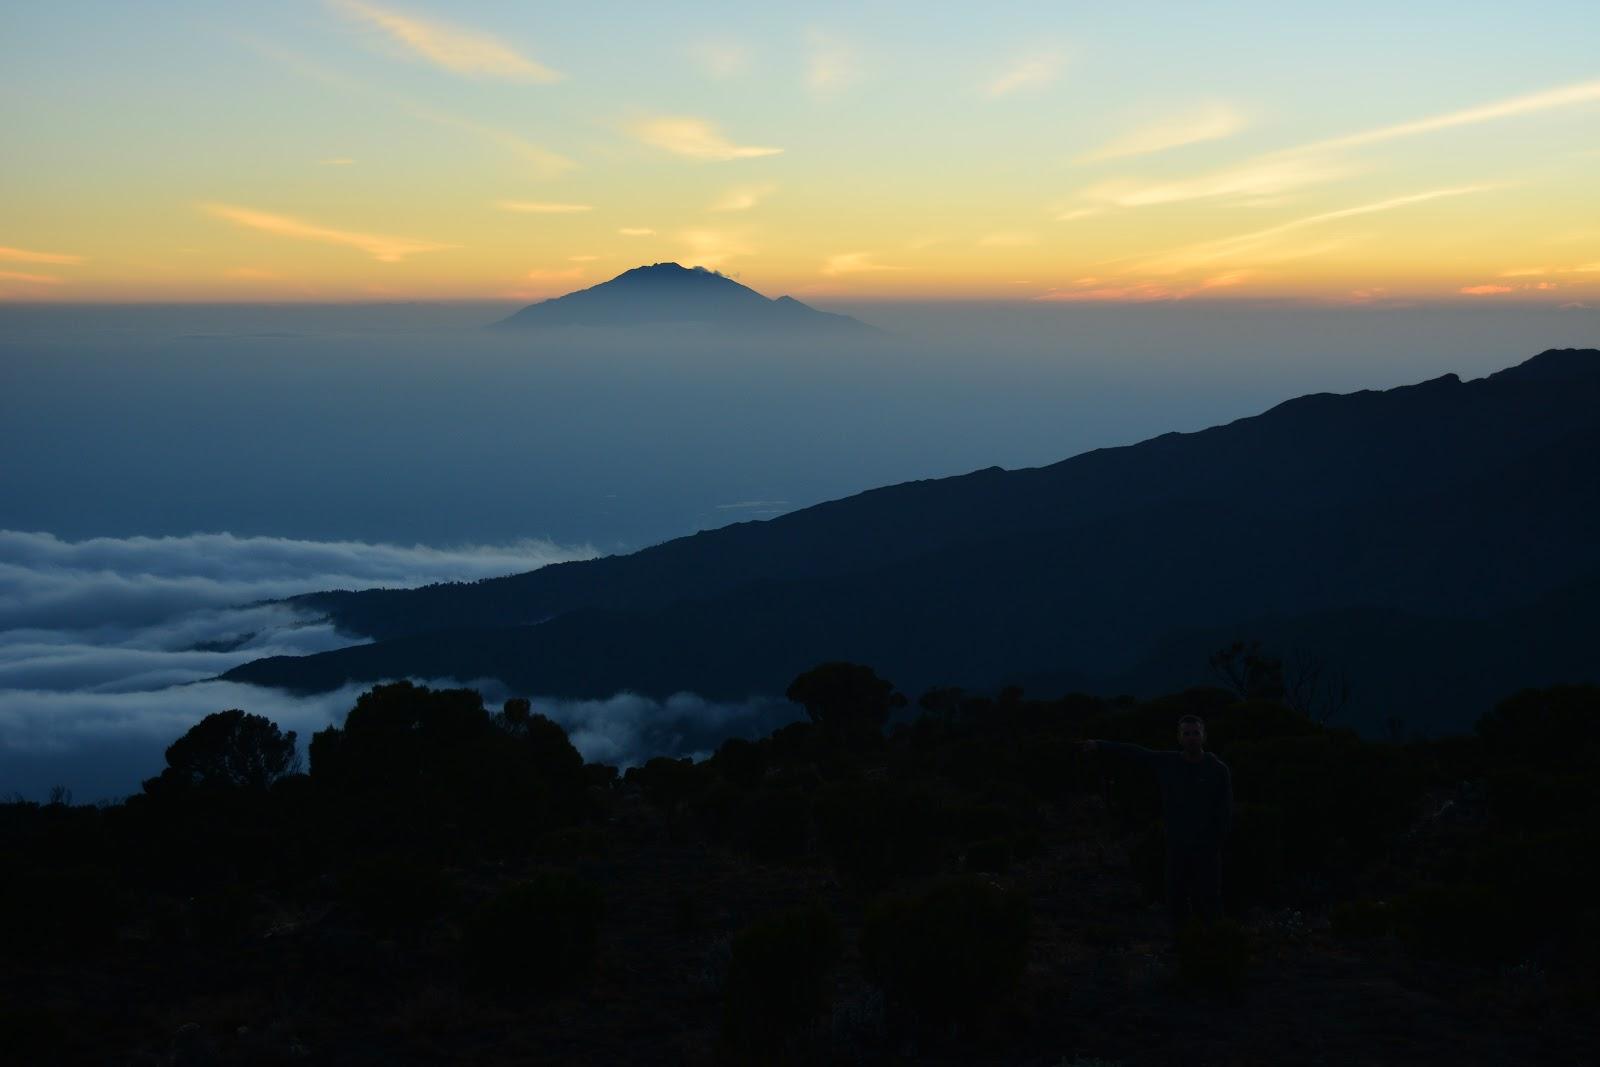 sunset, kilimanjaro, mountain, tanzania, childreach international, africa, challenge, fundraising, travel, abroad, zanzibar